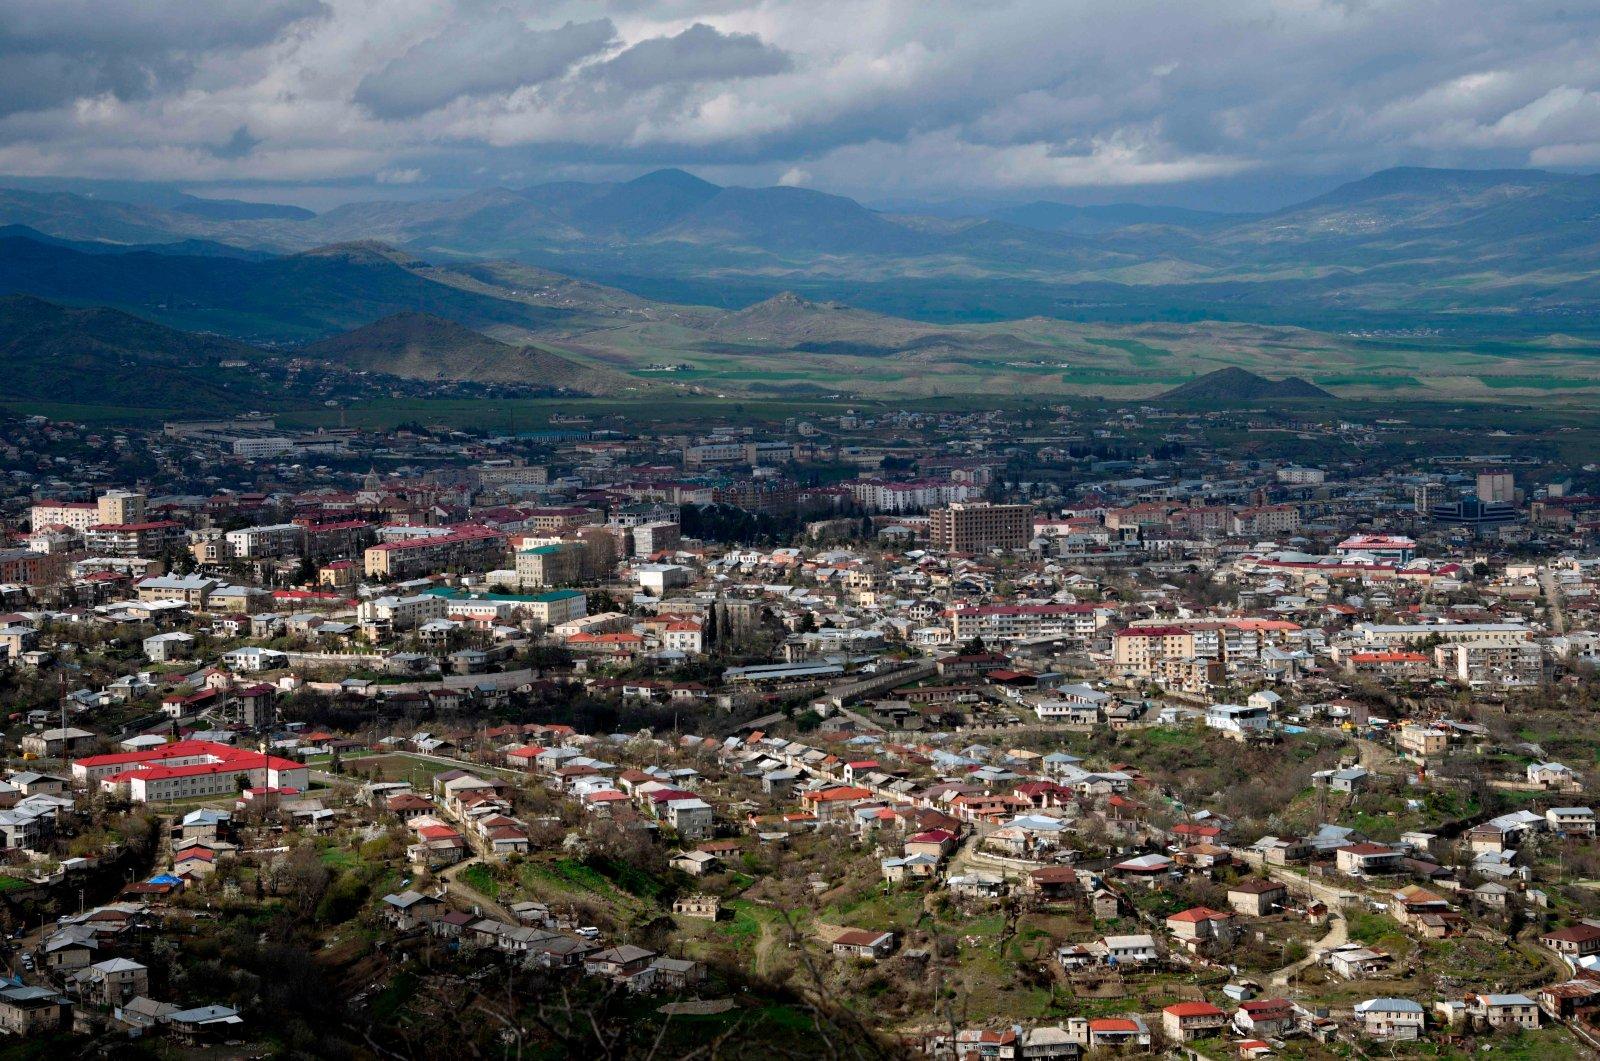 A general view of Stepanakert (Khankendi), the capital of the Armenian-occupied Azerbaijani region of Nagorno-Karabakh, April 4, 2016. (AFP Photo)